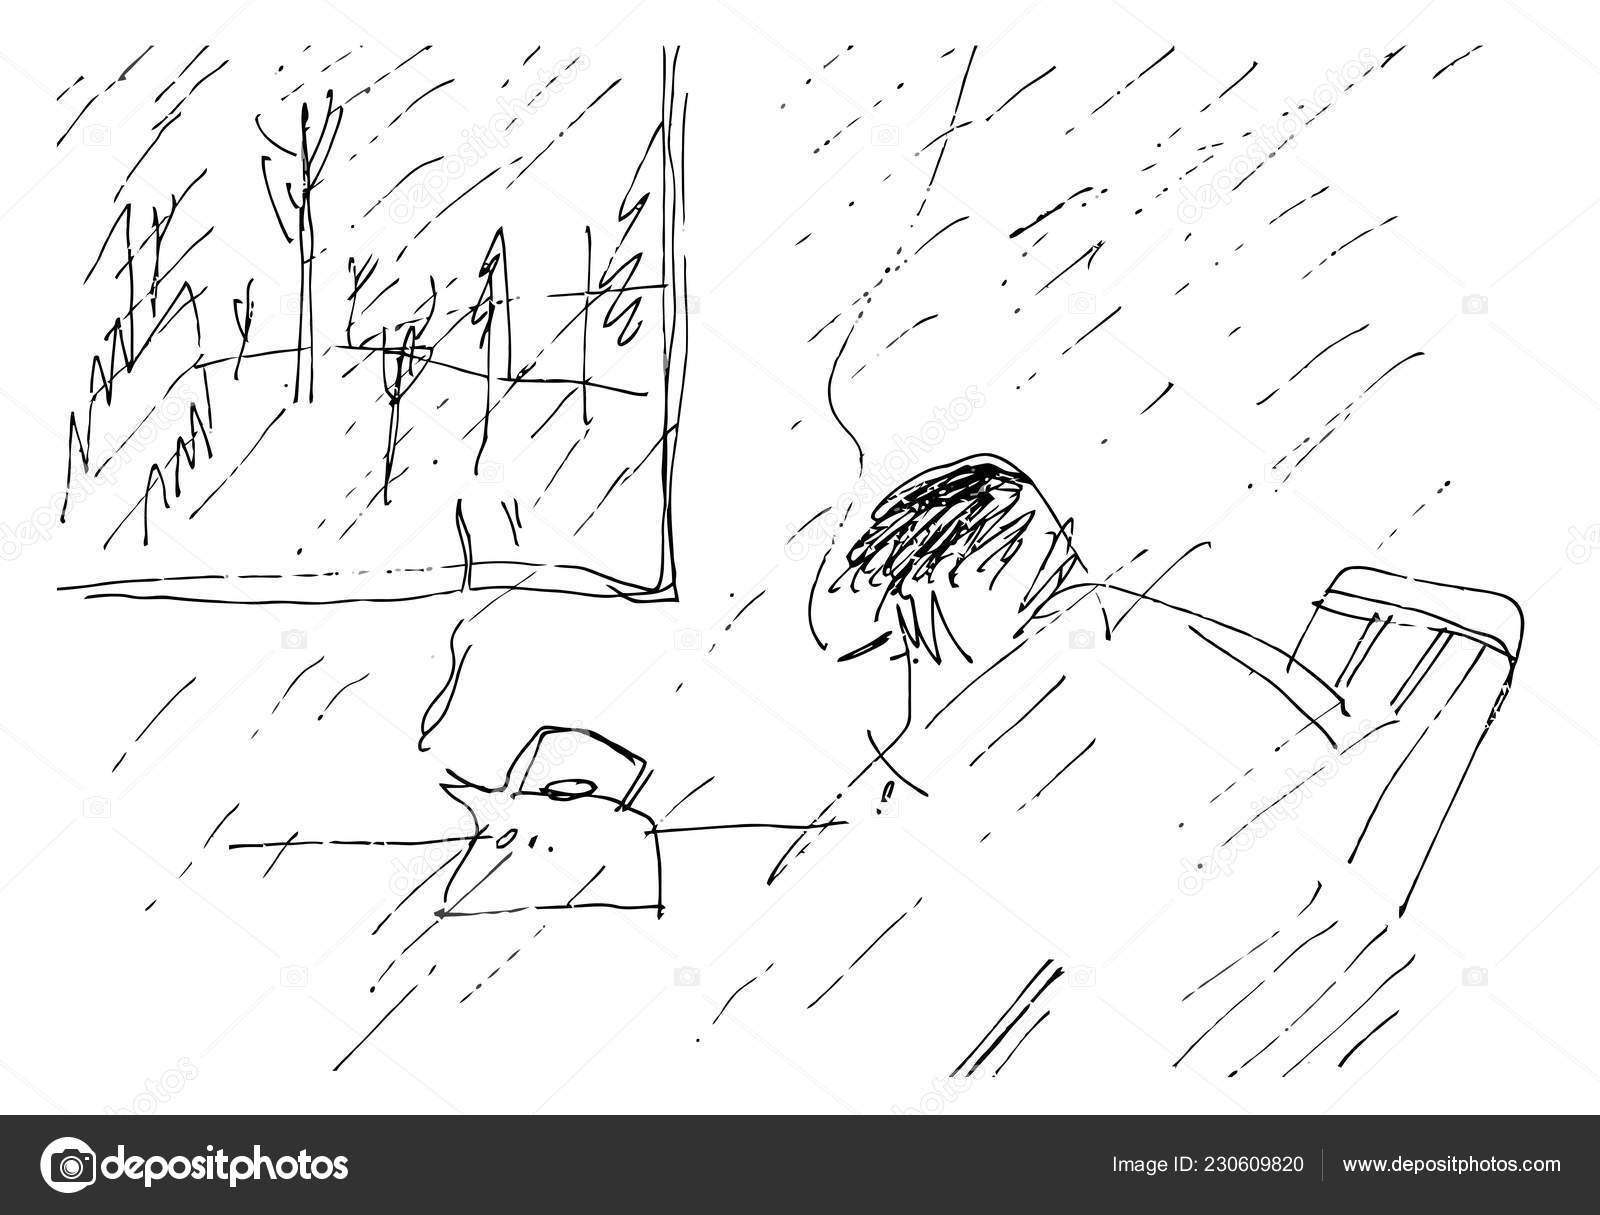 Rainy season drawing black and white sad rainy day black